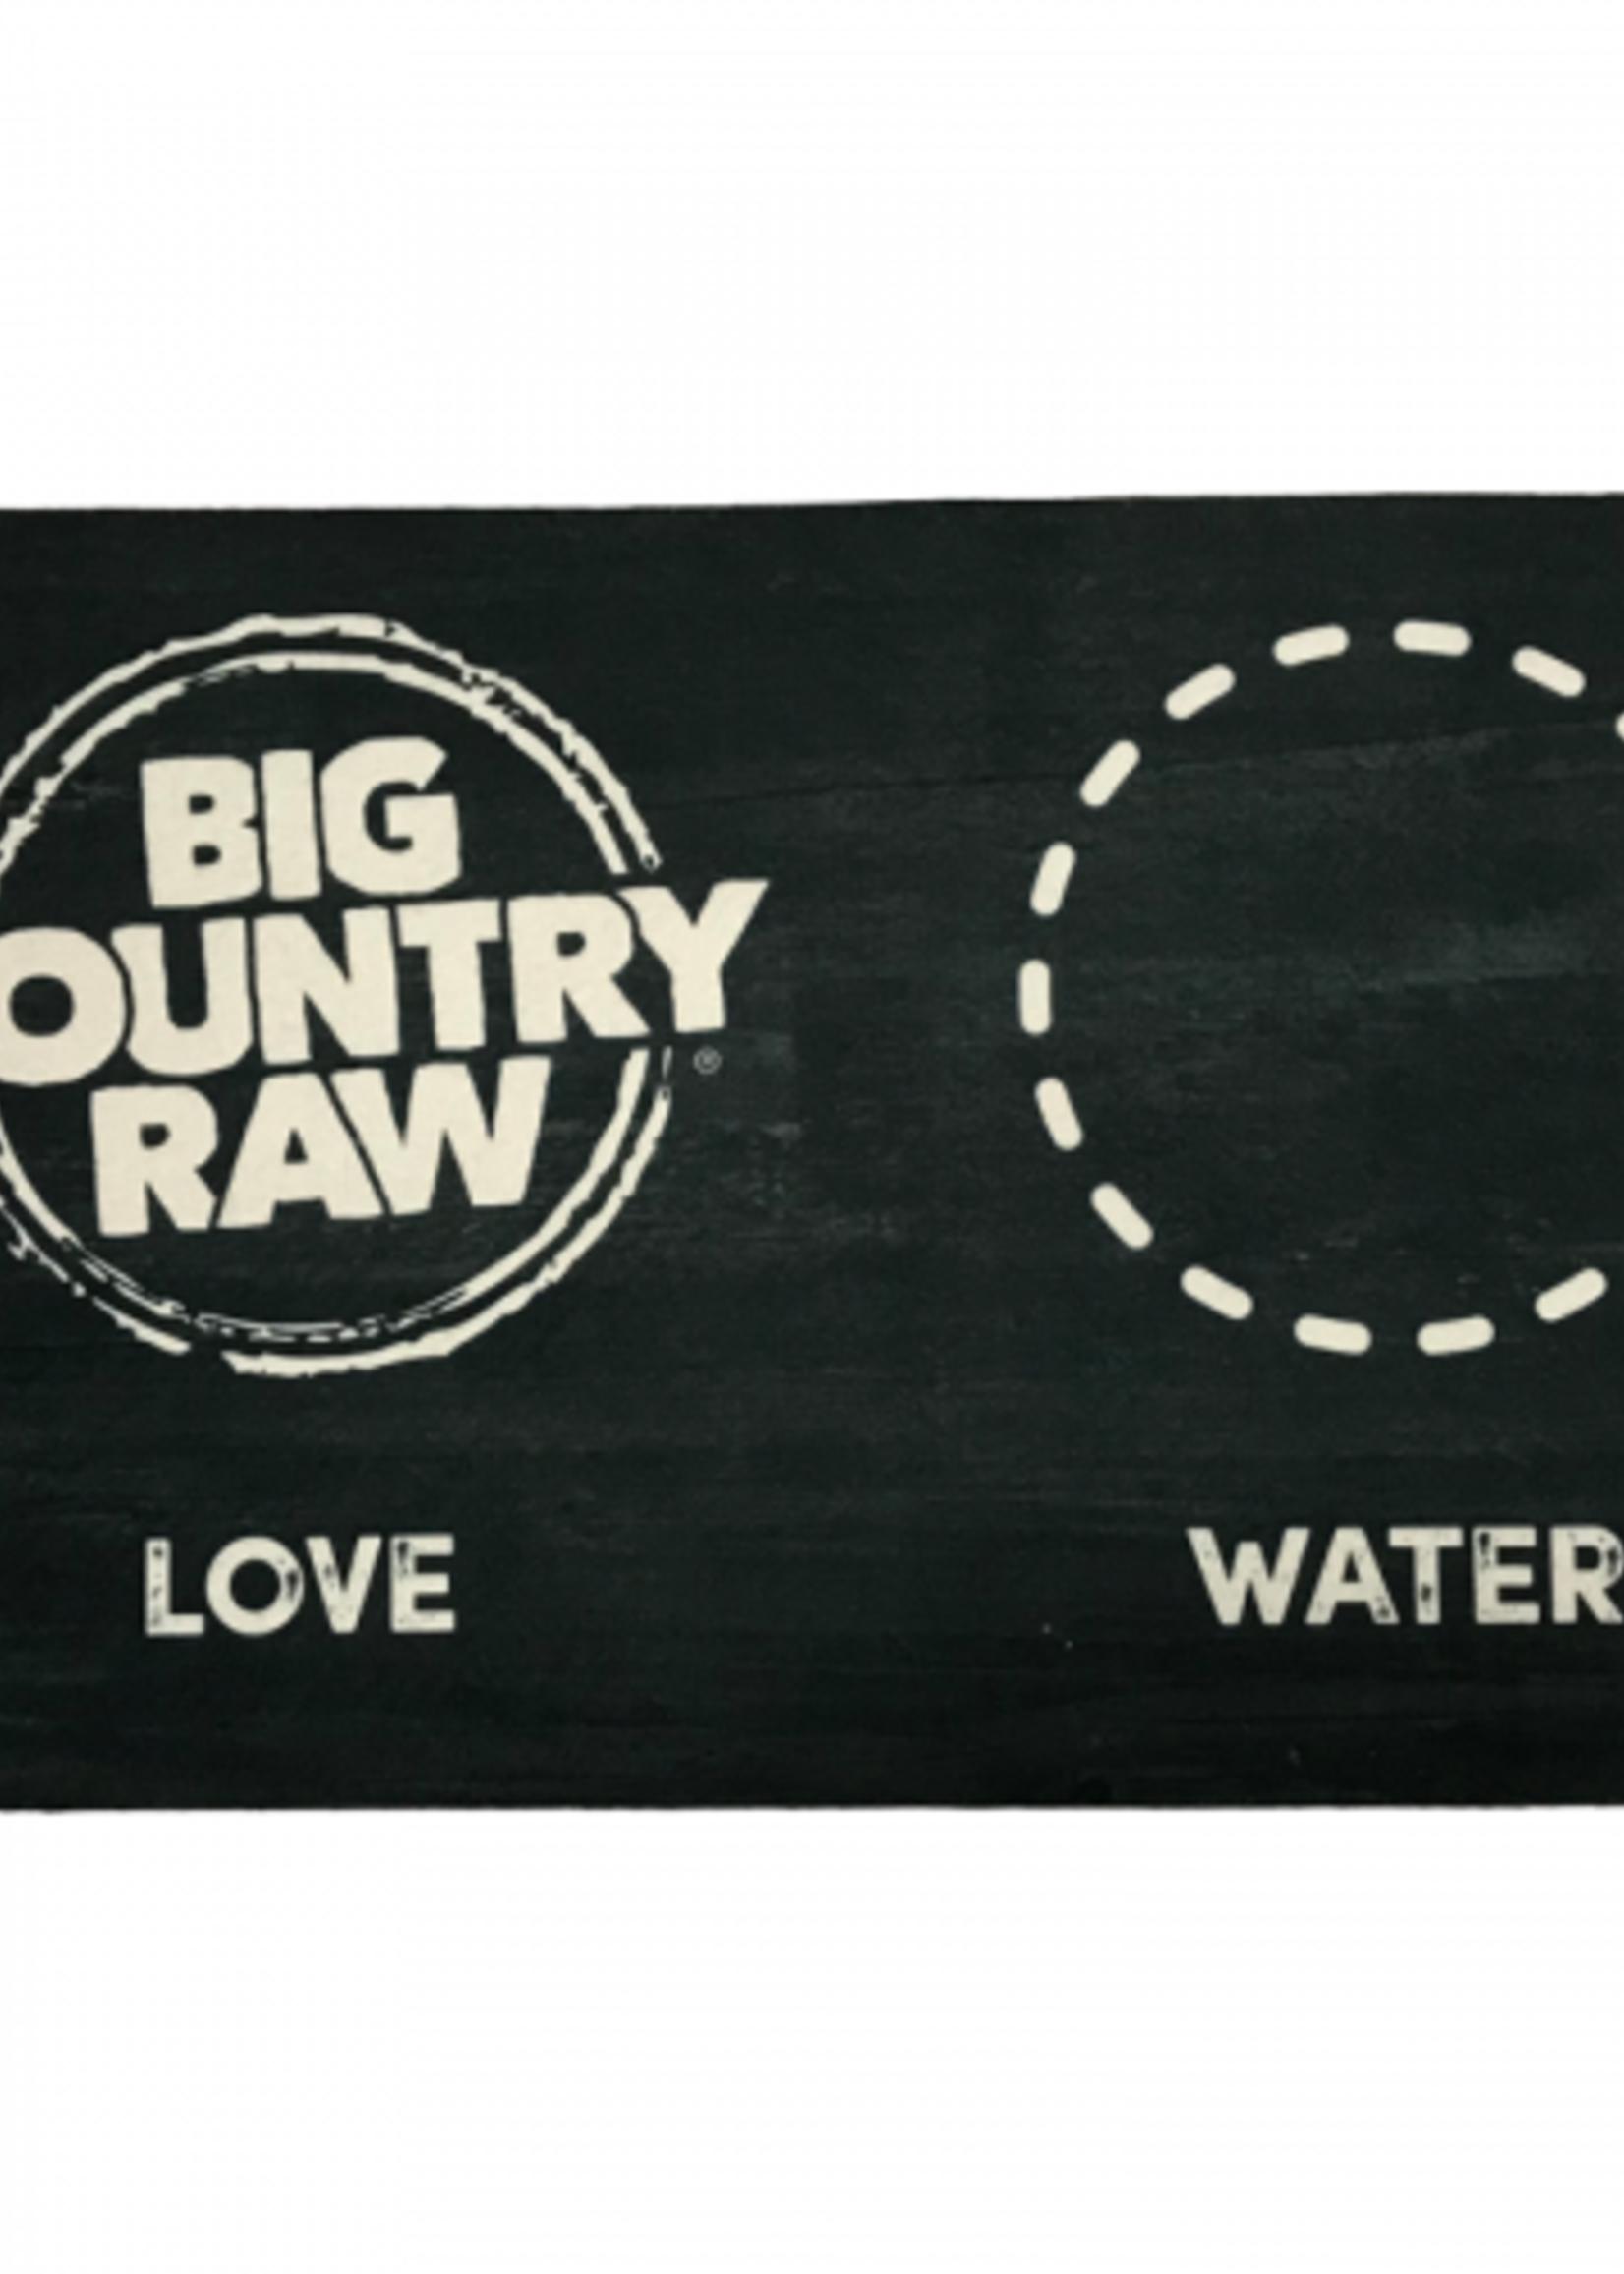 Big Country Raw Big Country Raw Pet Mat